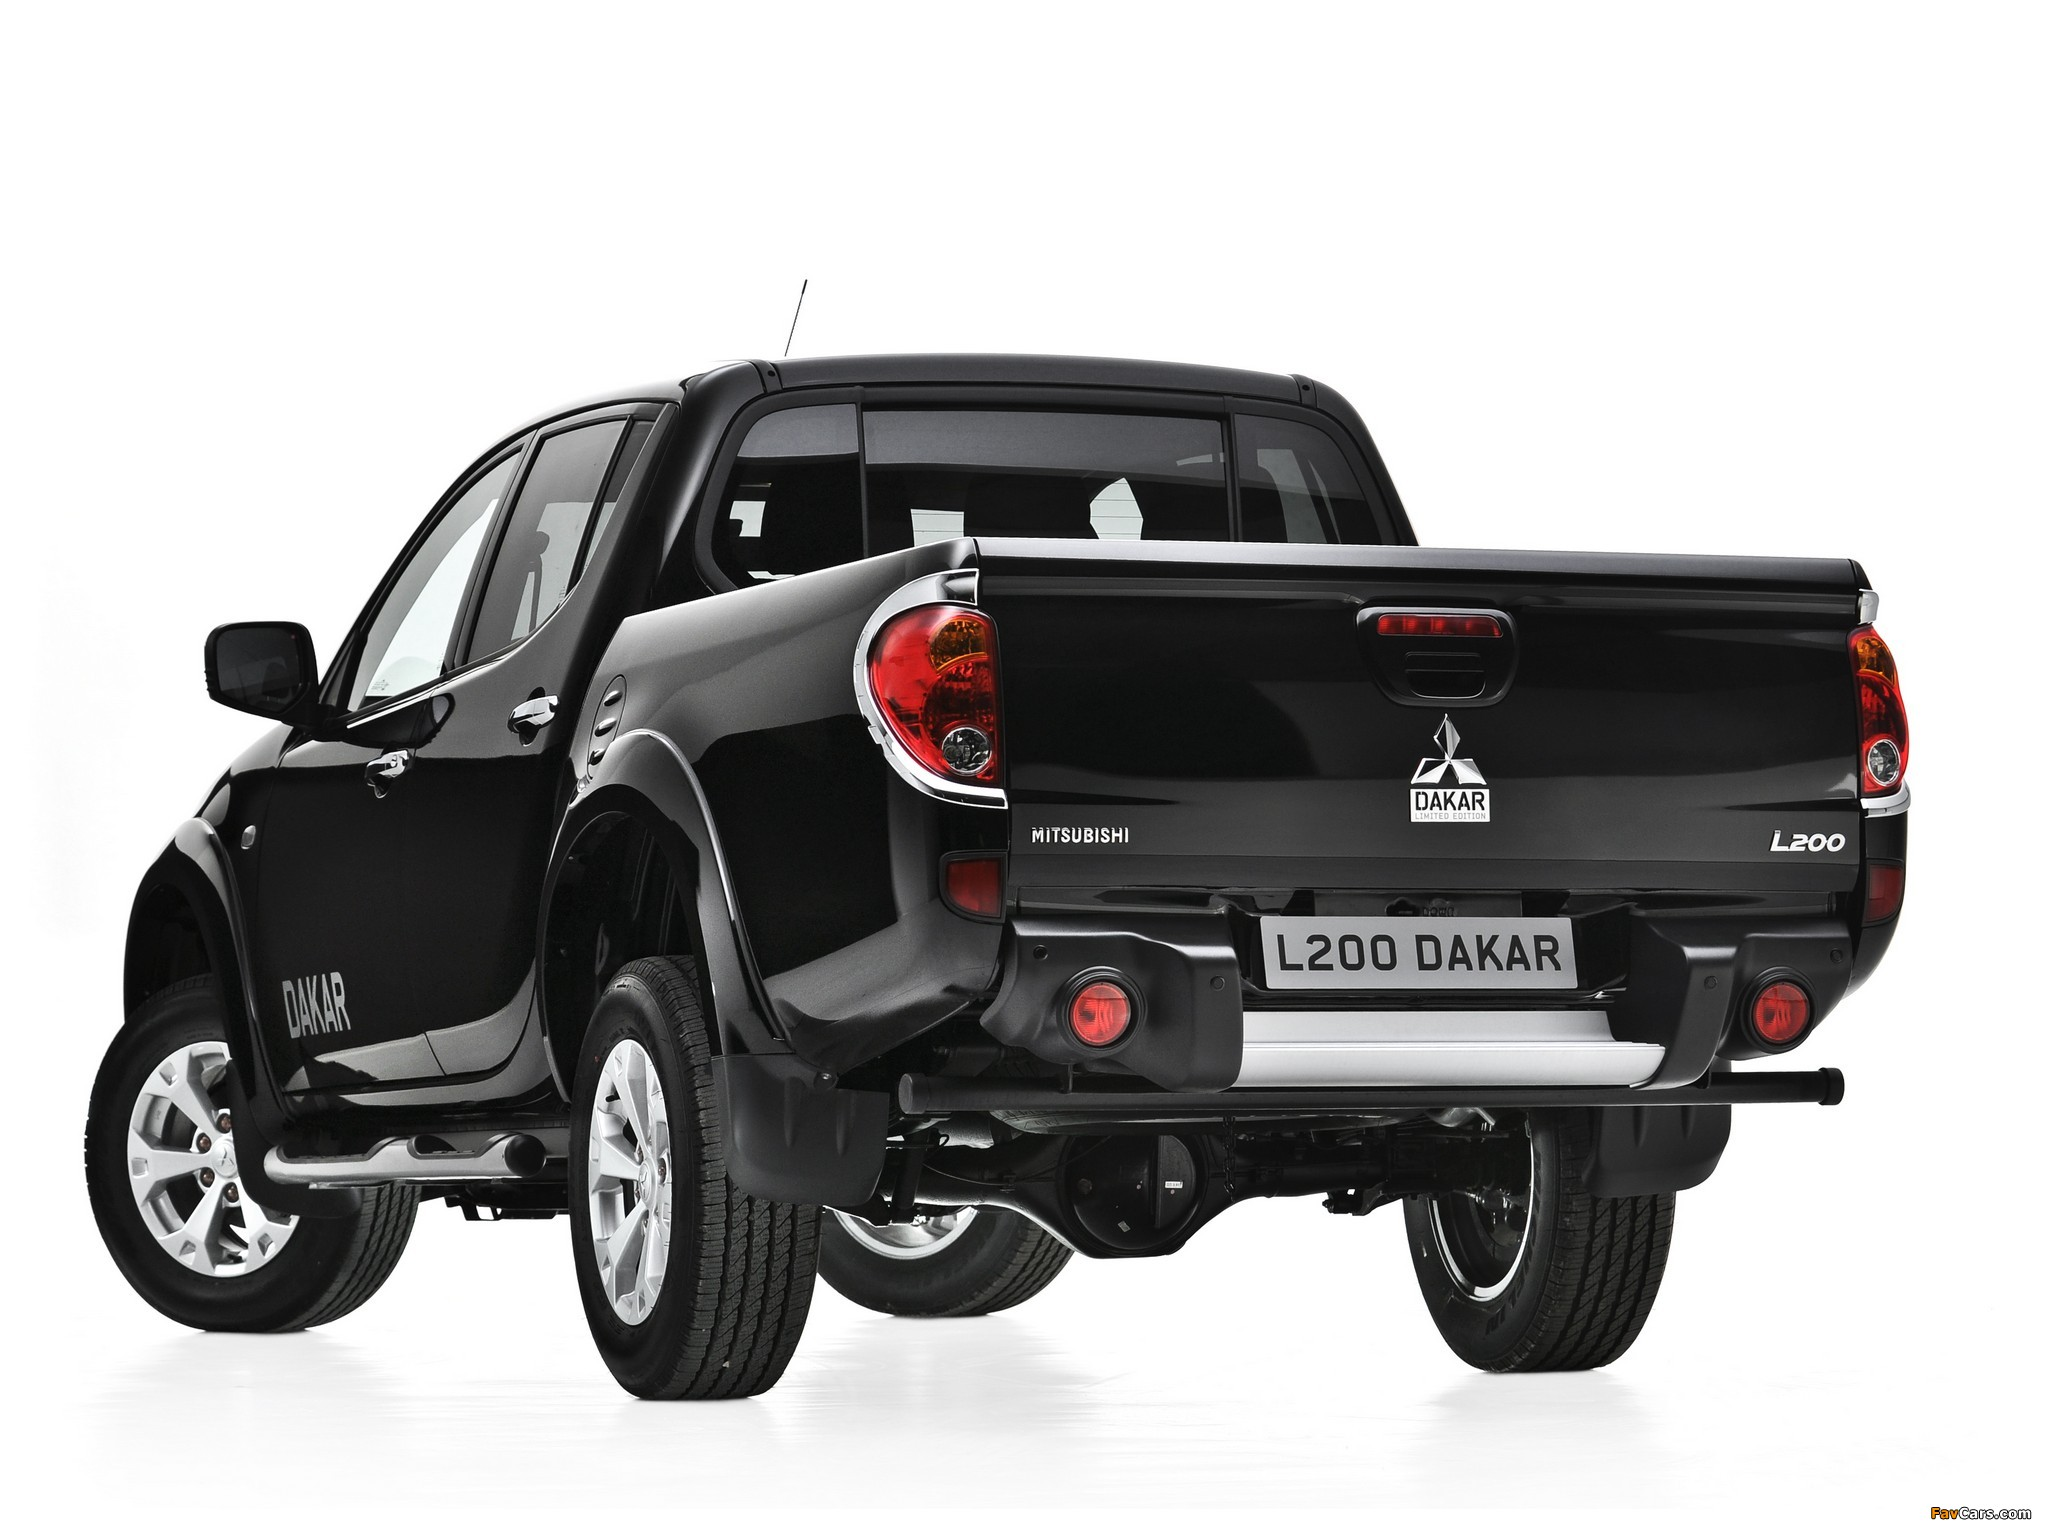 Mitsubishi L200 Dakar 2012 images (2048 x 1536)